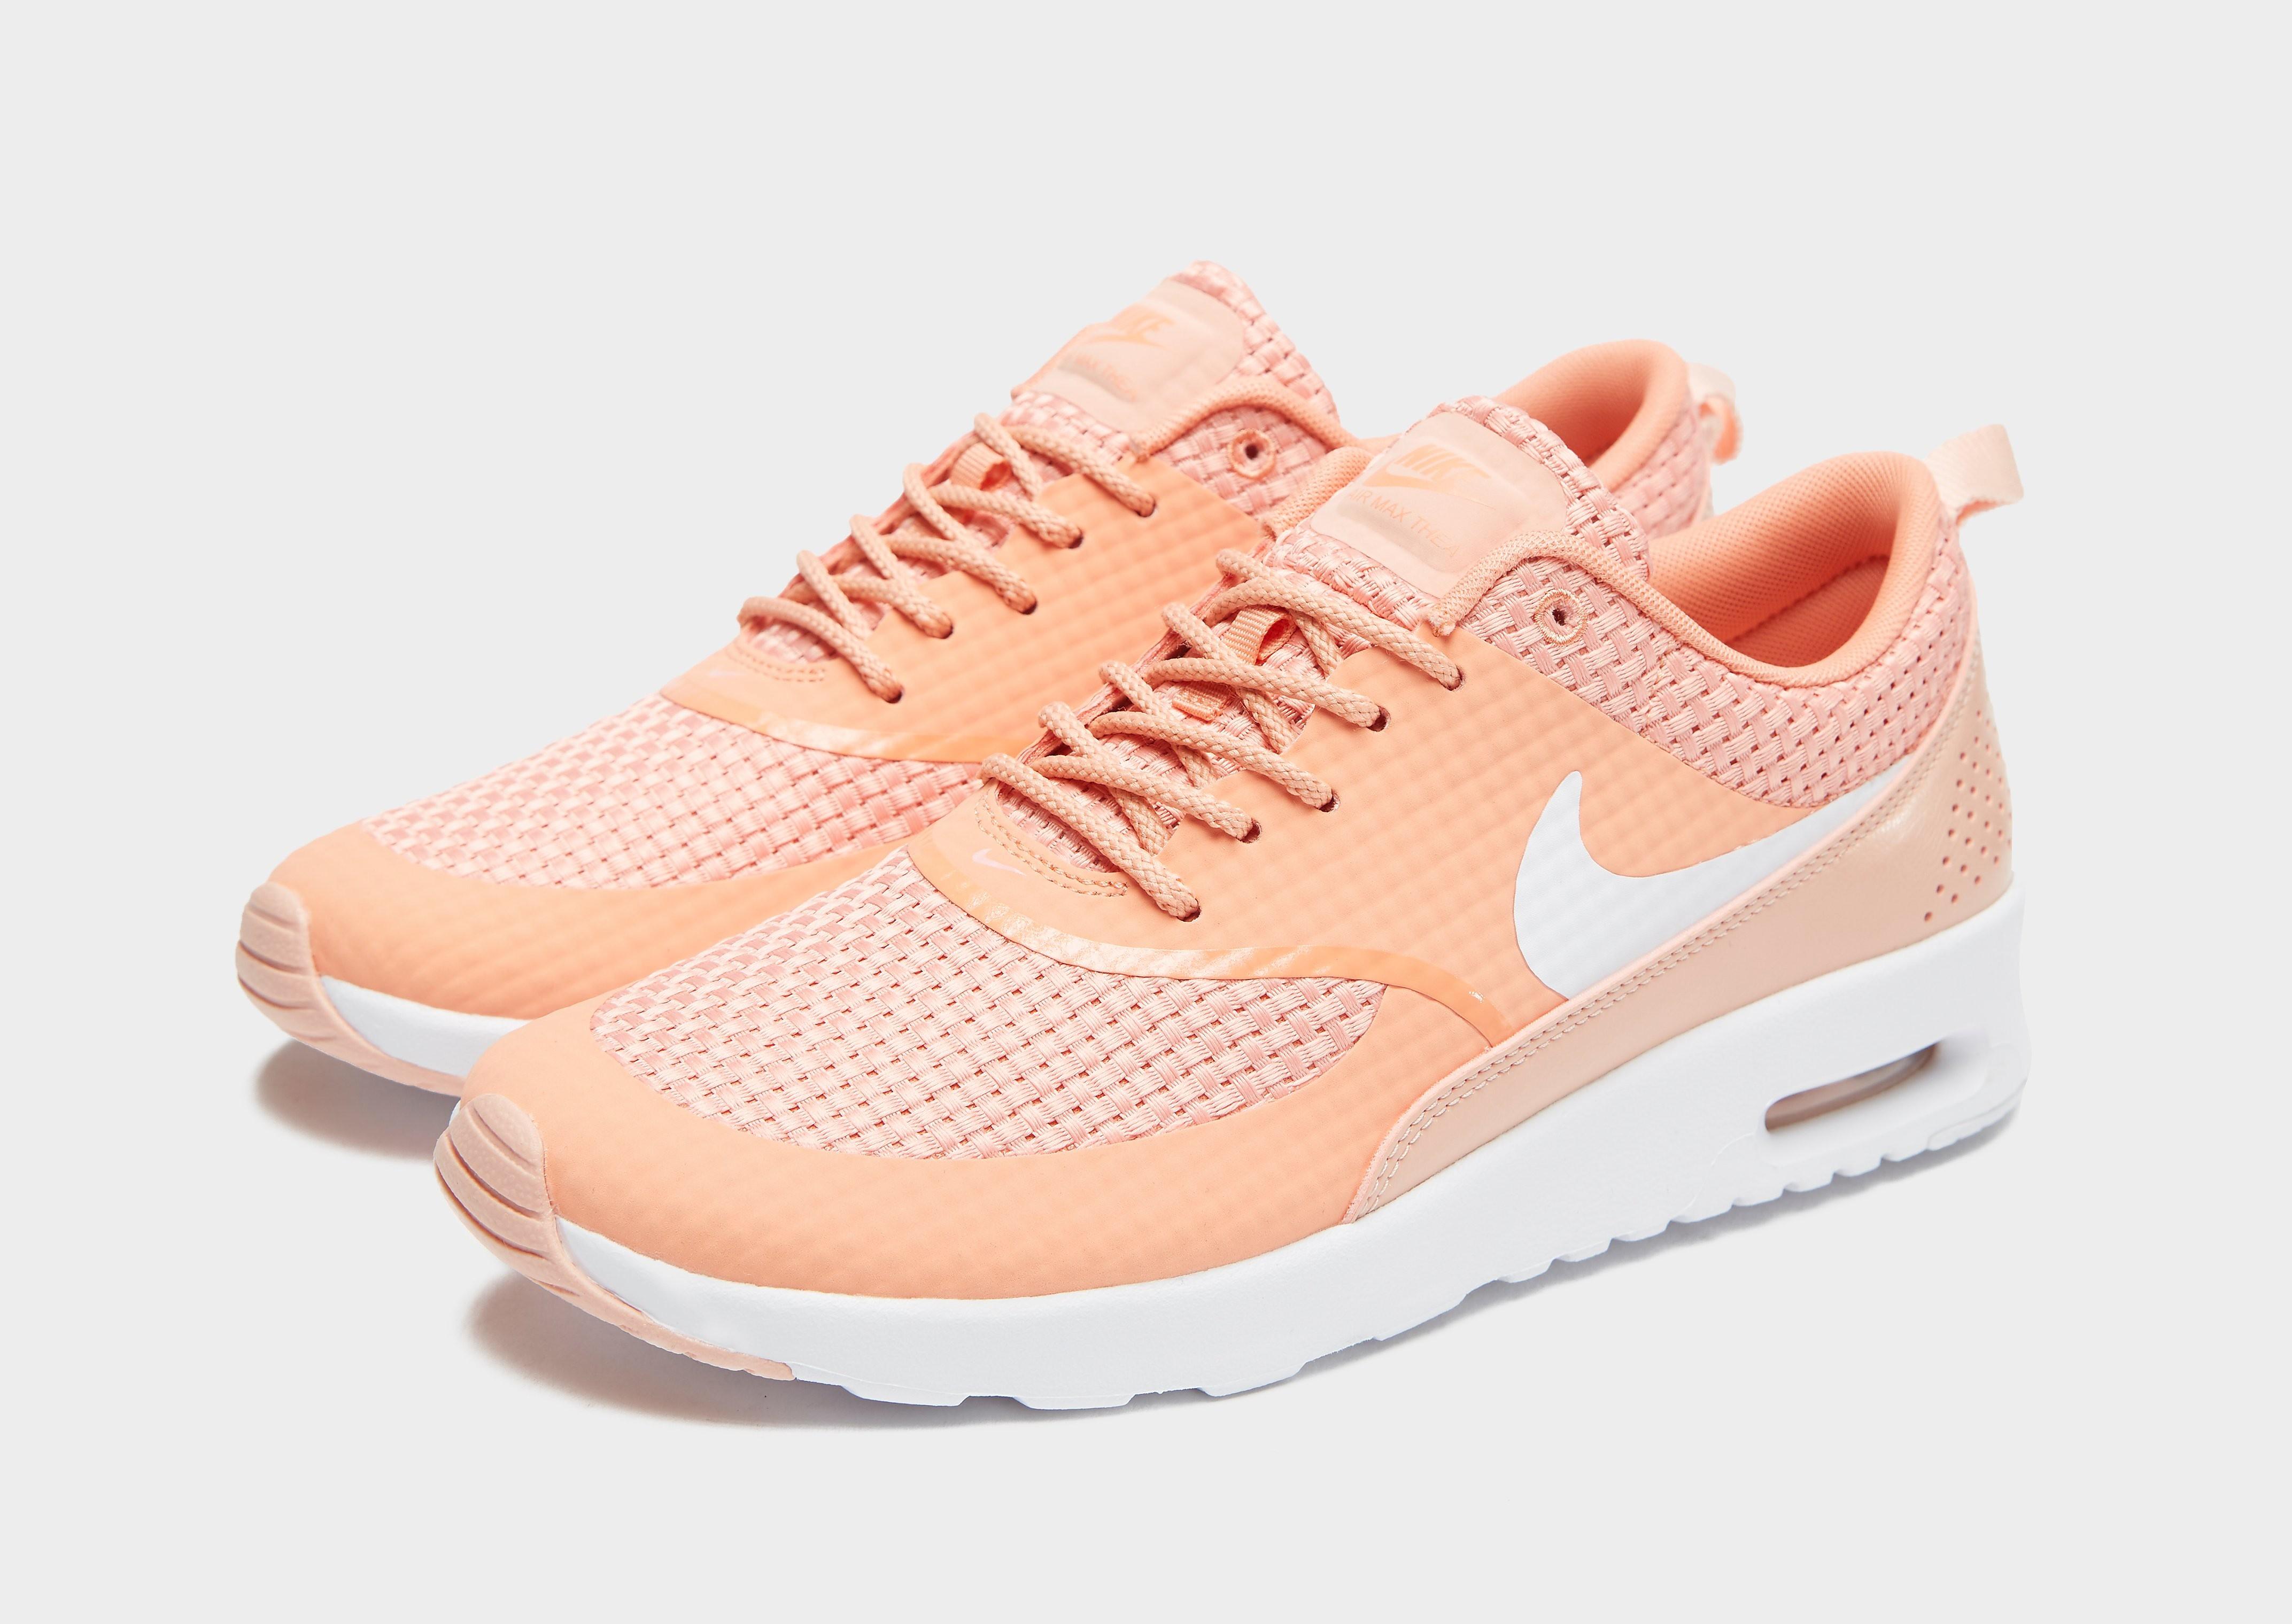 Nike Air Max Thea Woven Women's